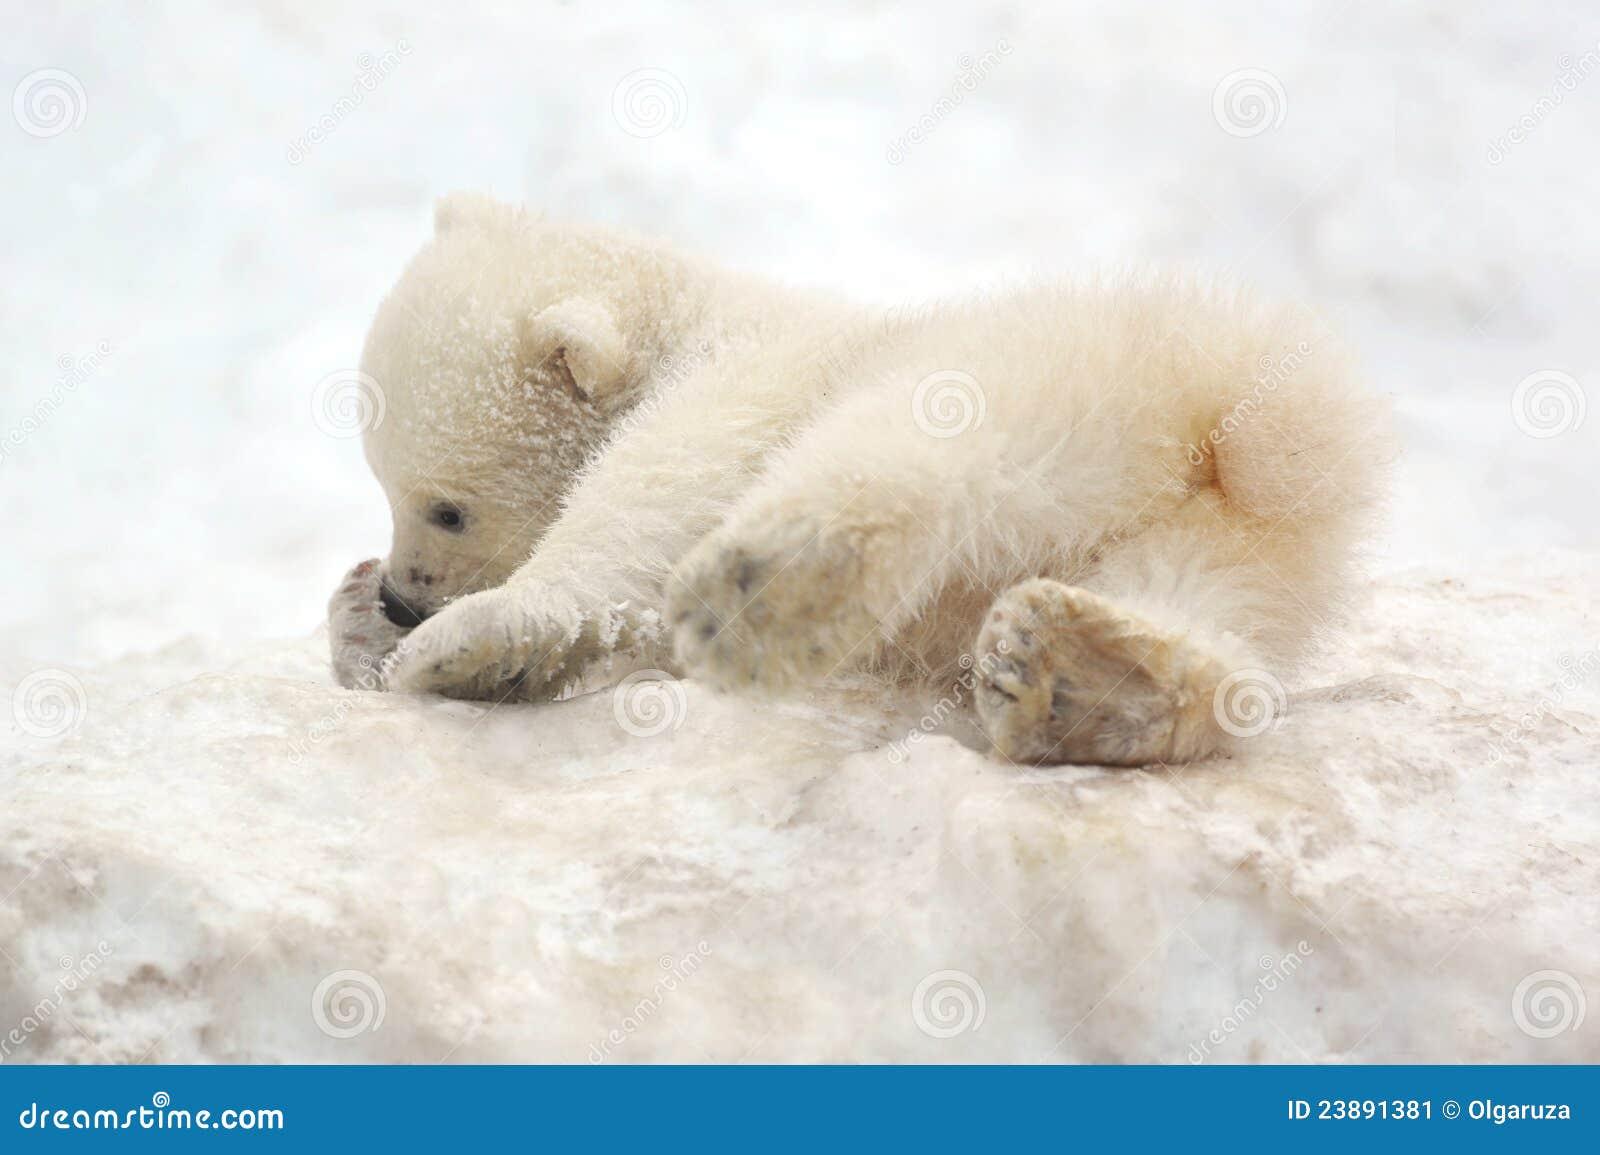 arctic tundra polar bear